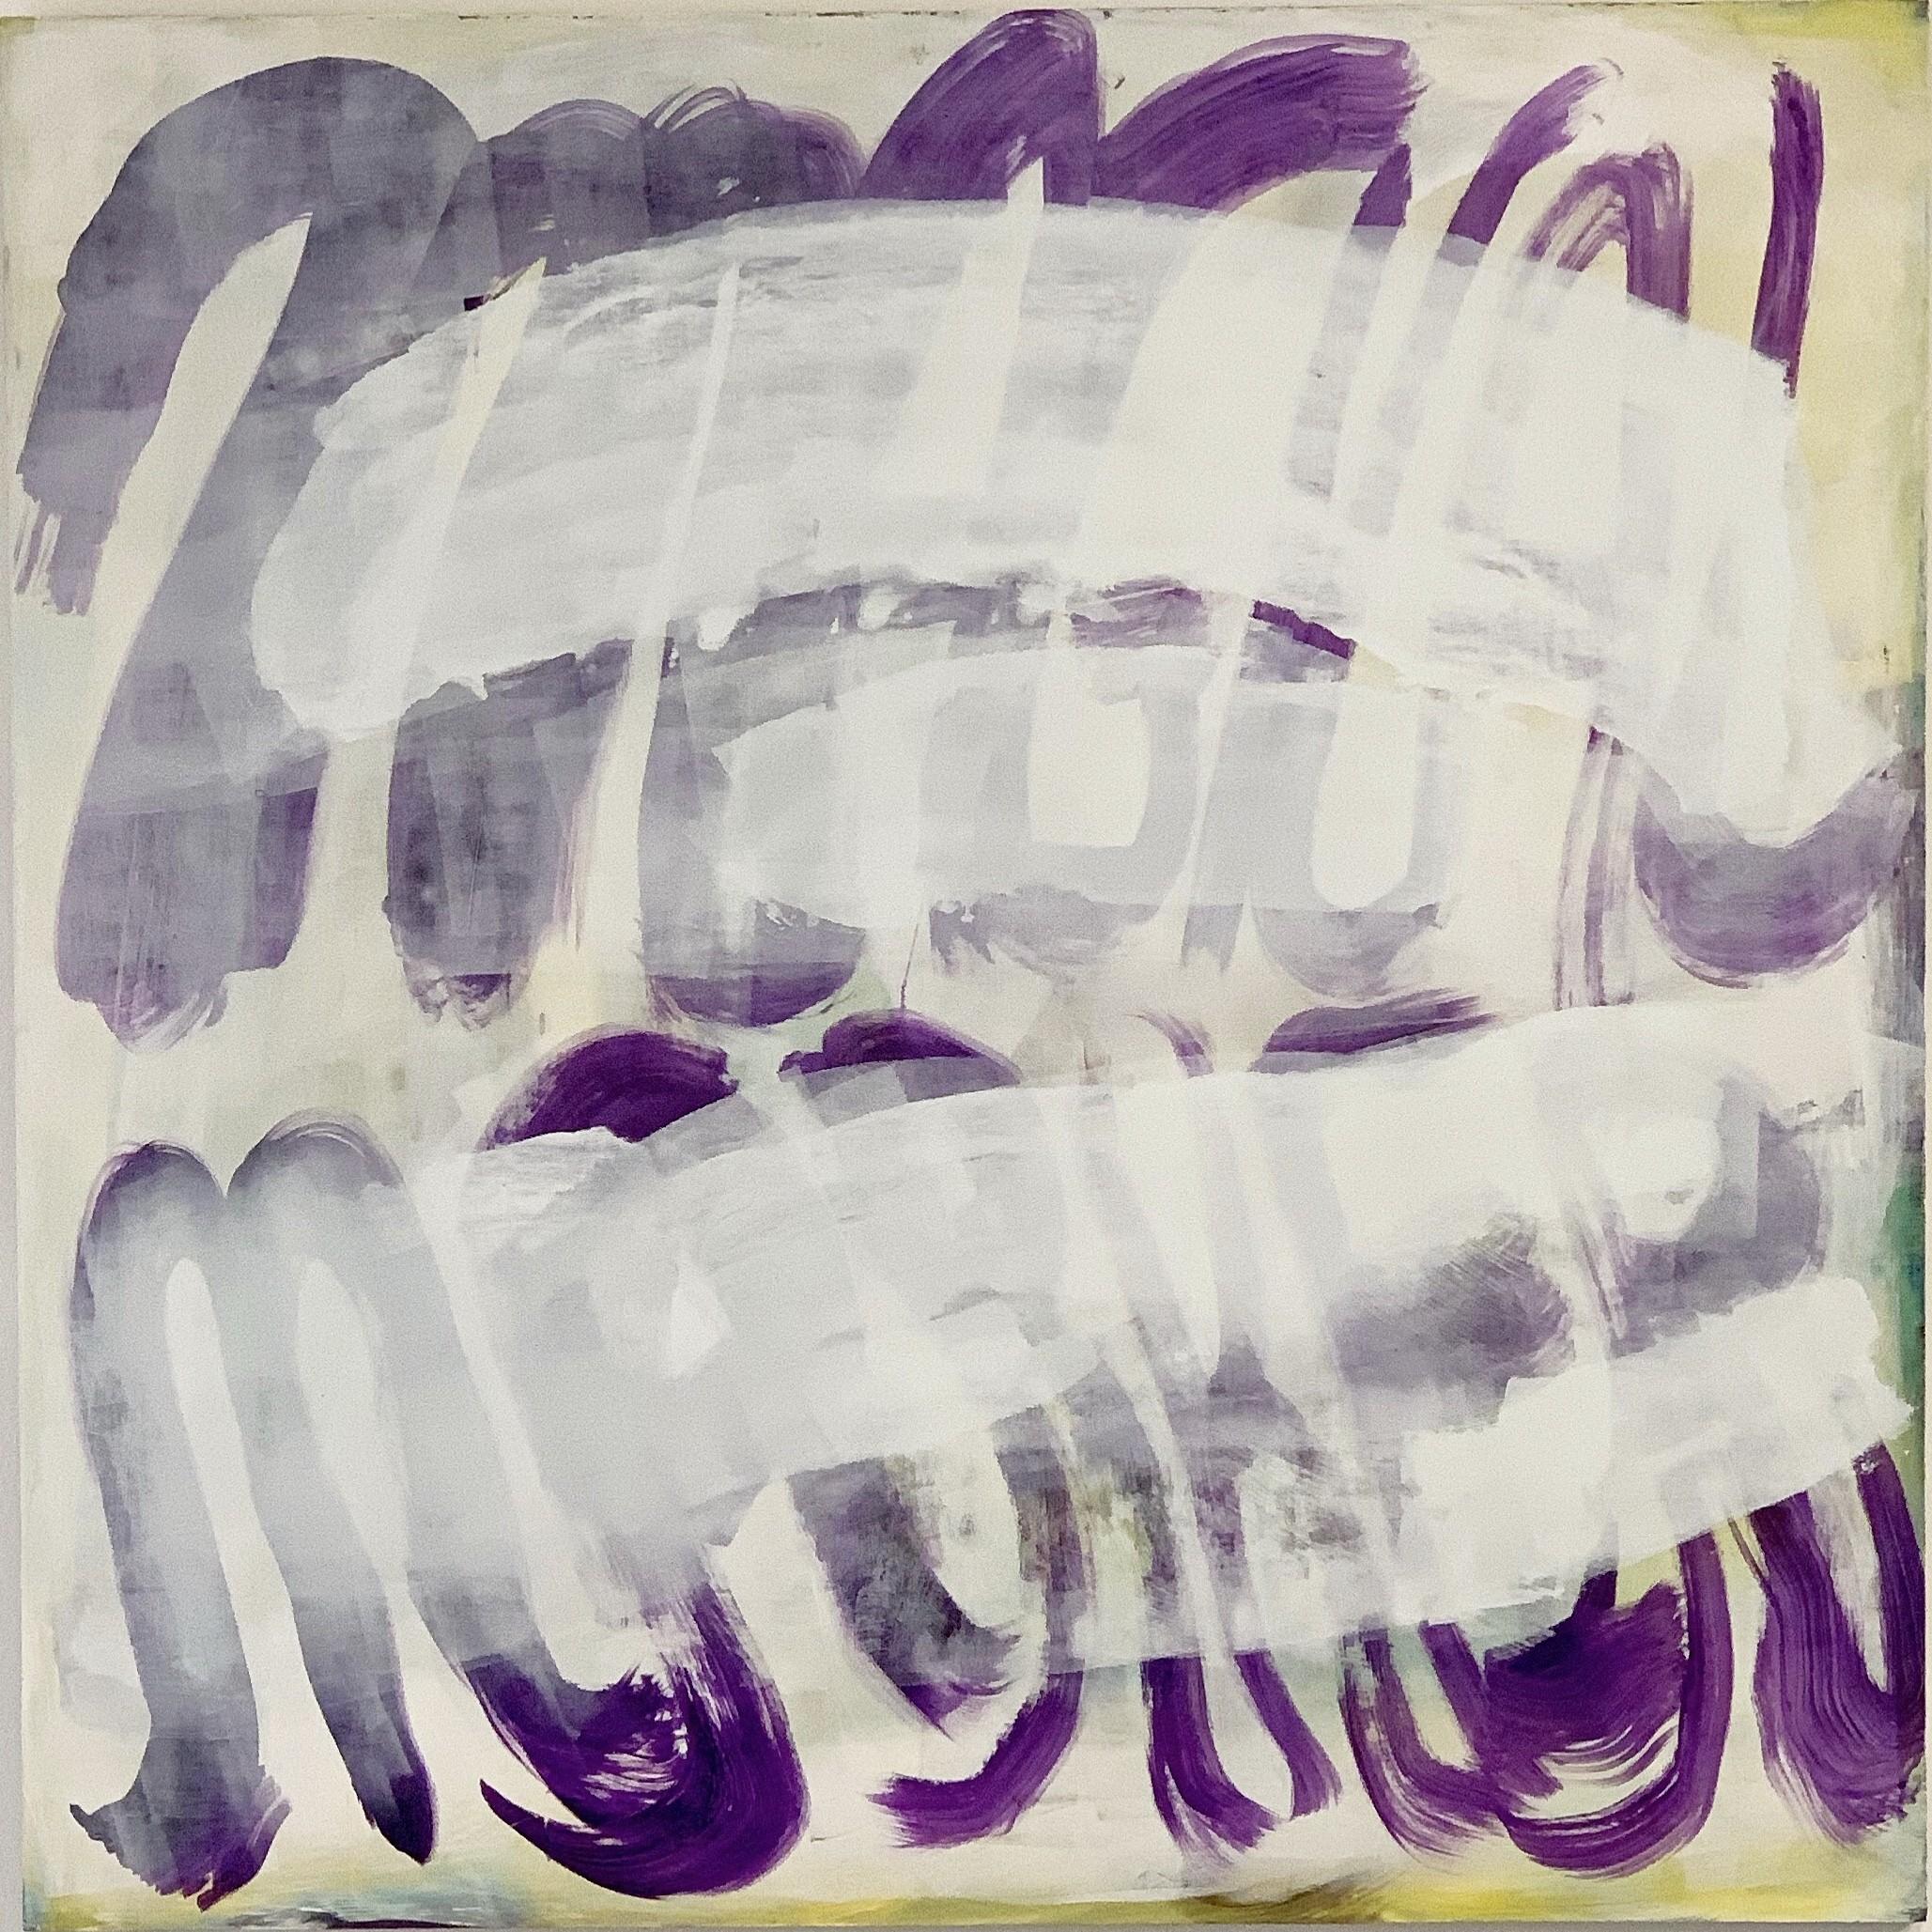 <span class=&#34;link fancybox-details-link&#34;><a href=&#34;/artworks/292-dana-frankfort-magical-marker-2017/&#34;>View Detail Page</a></span><div class=&#34;artist&#34;><strong>Dana Frankfort</strong></div> <div class=&#34;title&#34;><em>Magical Marker</em>, 2017</div> <div class=&#34;medium&#34;>Oil on linen over panel</div> <div class=&#34;dimensions&#34;>48 x 48 in<br /> 121.9 x 121.9 cm</div>